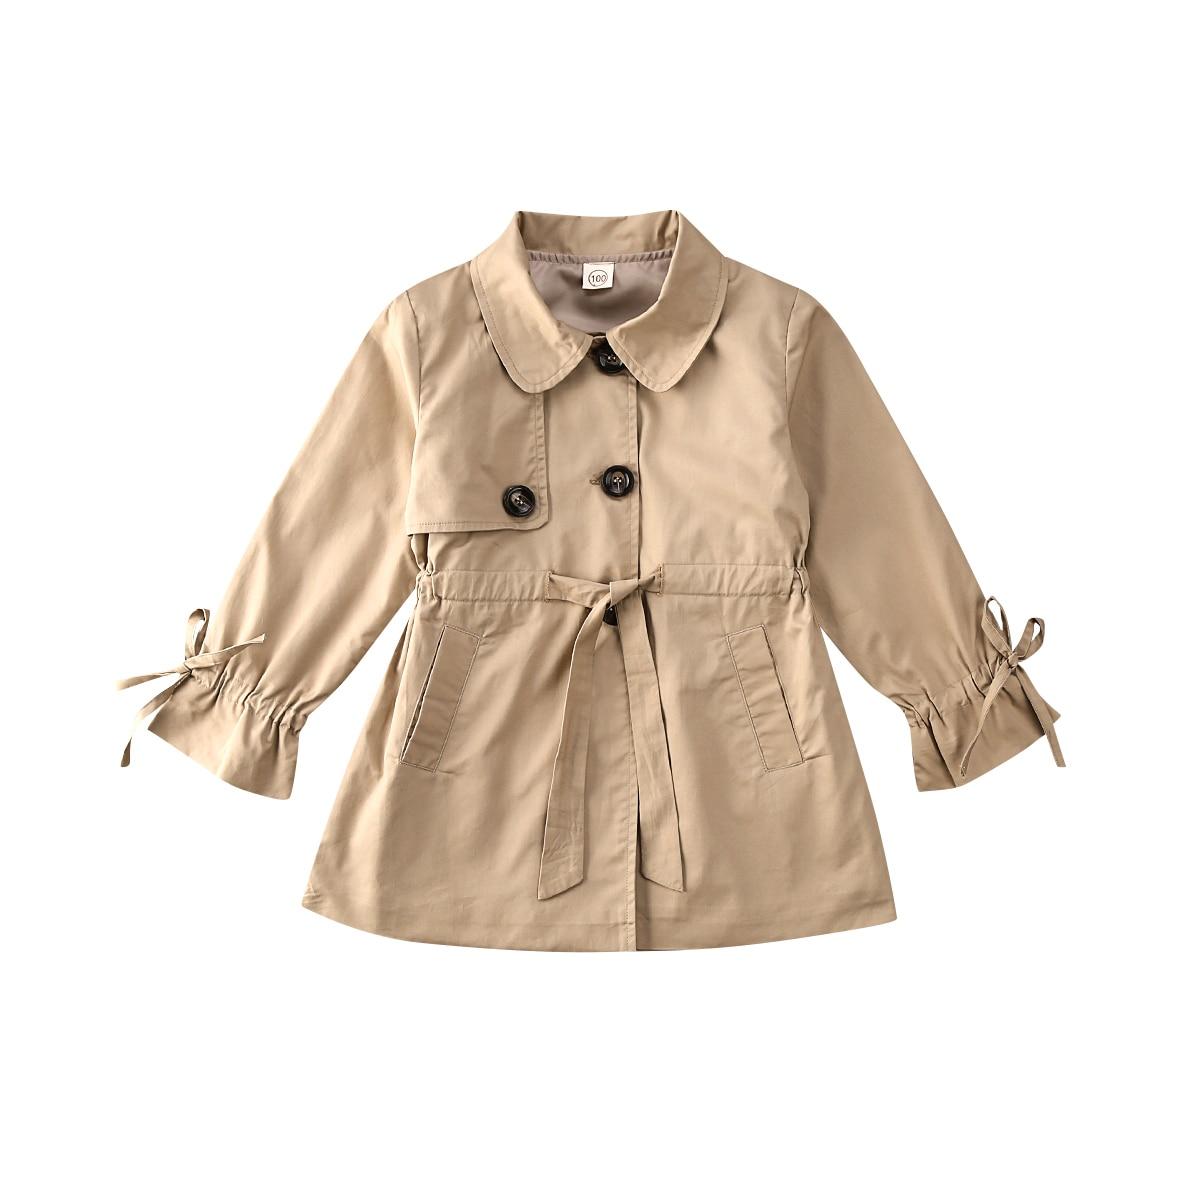 Kid Baby Girl Clothes Coat Jacket Solid Windbreaker Outwear Overcoat Snowsuit Warm Winter Button Sweet Princess Clothing